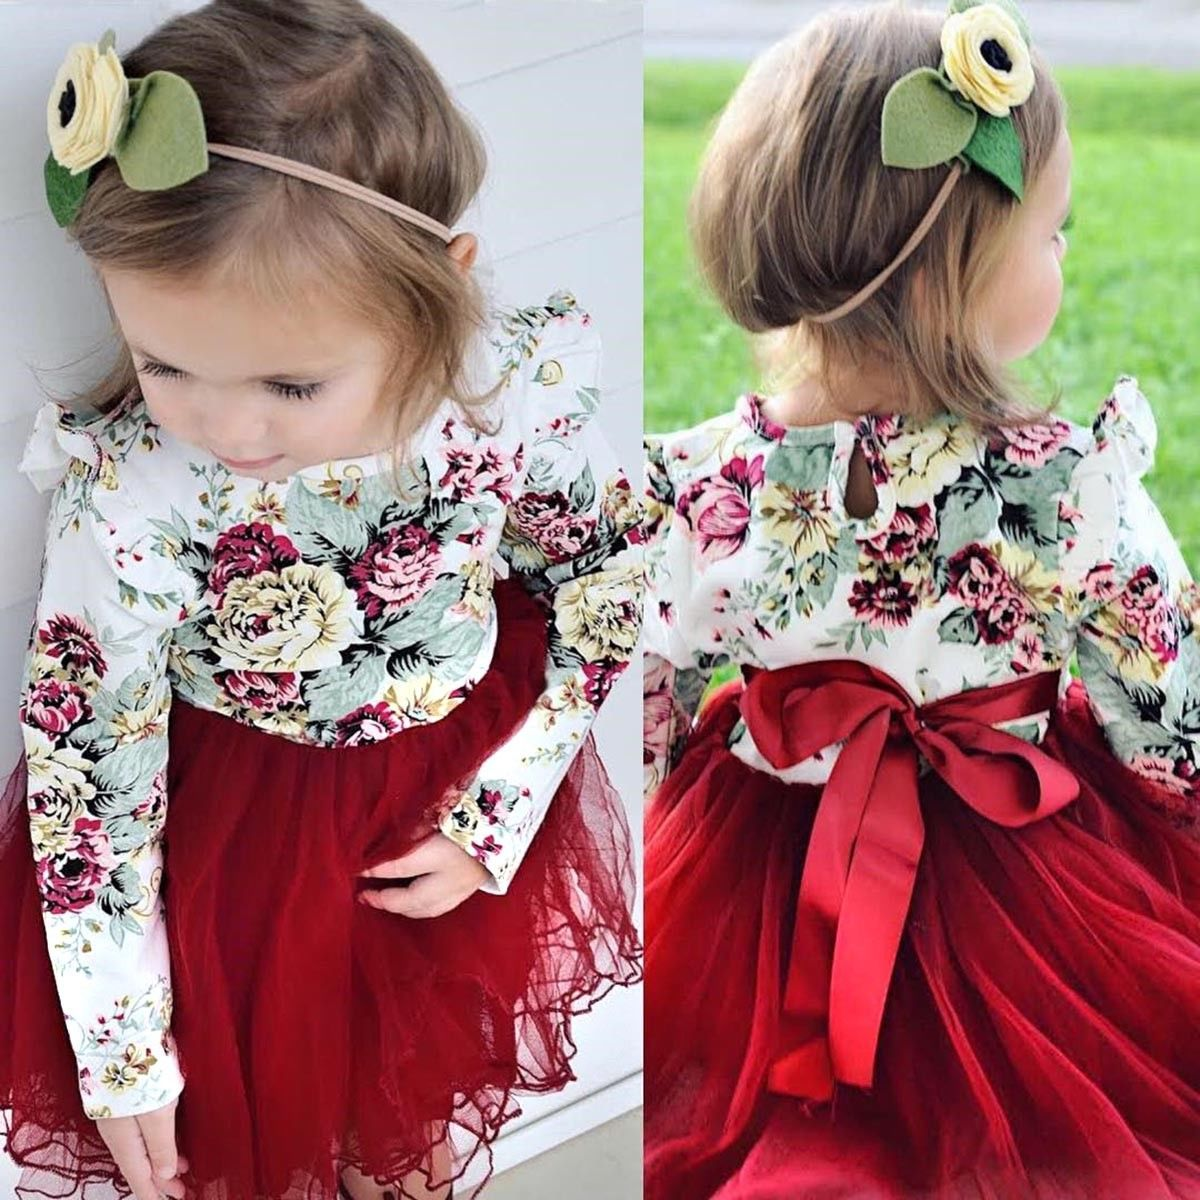 Flower Girls Princess Dress Kids Baby Party Wedding Pageant Long Sleeve Dresses